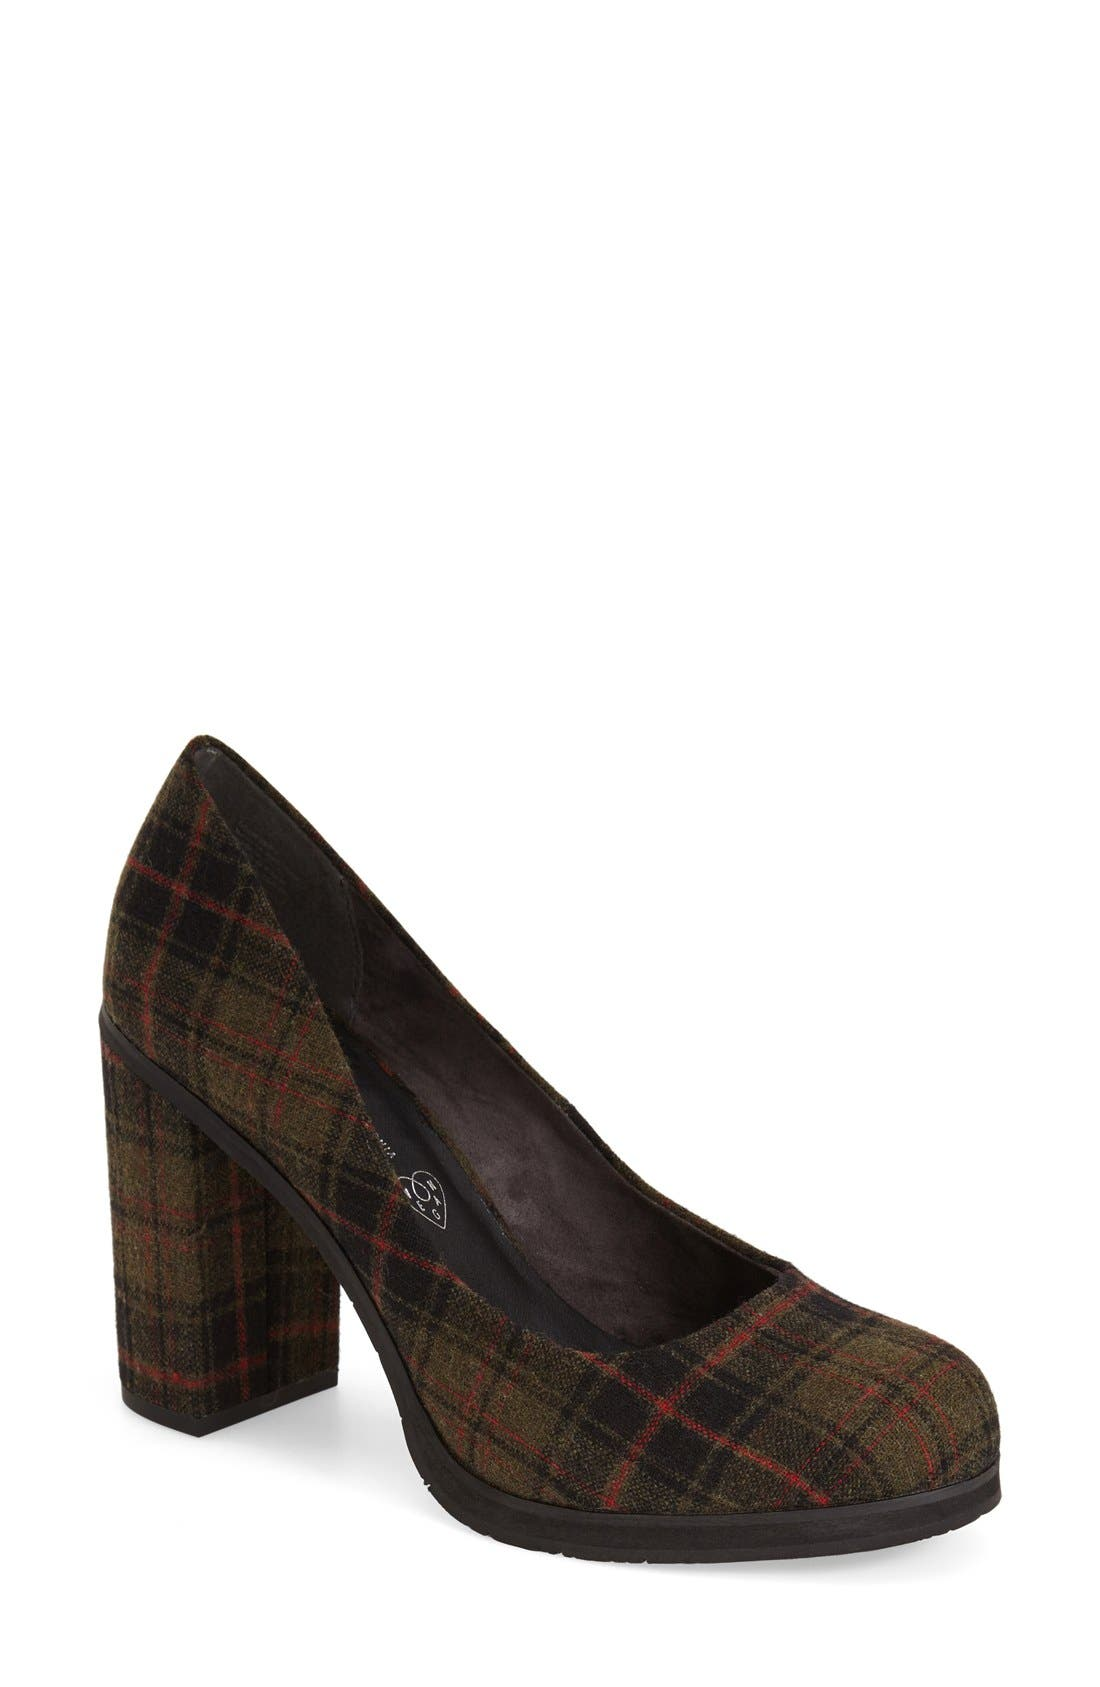 Main Image - BC Footwear 'Turf' Pump (Women)